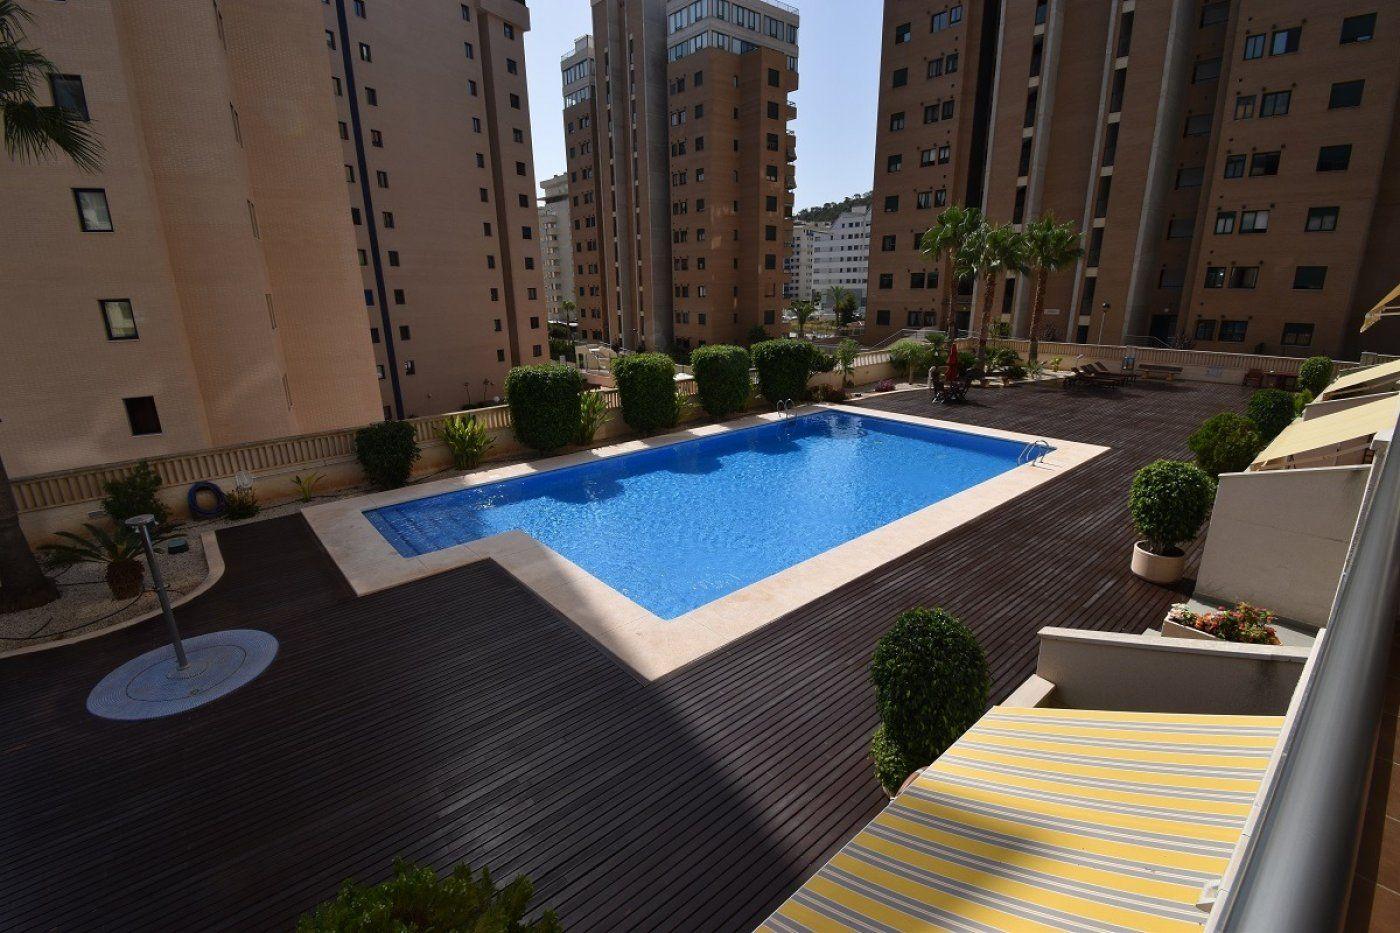 Appartement à Villajoyosa, cala de villajoyosa, location